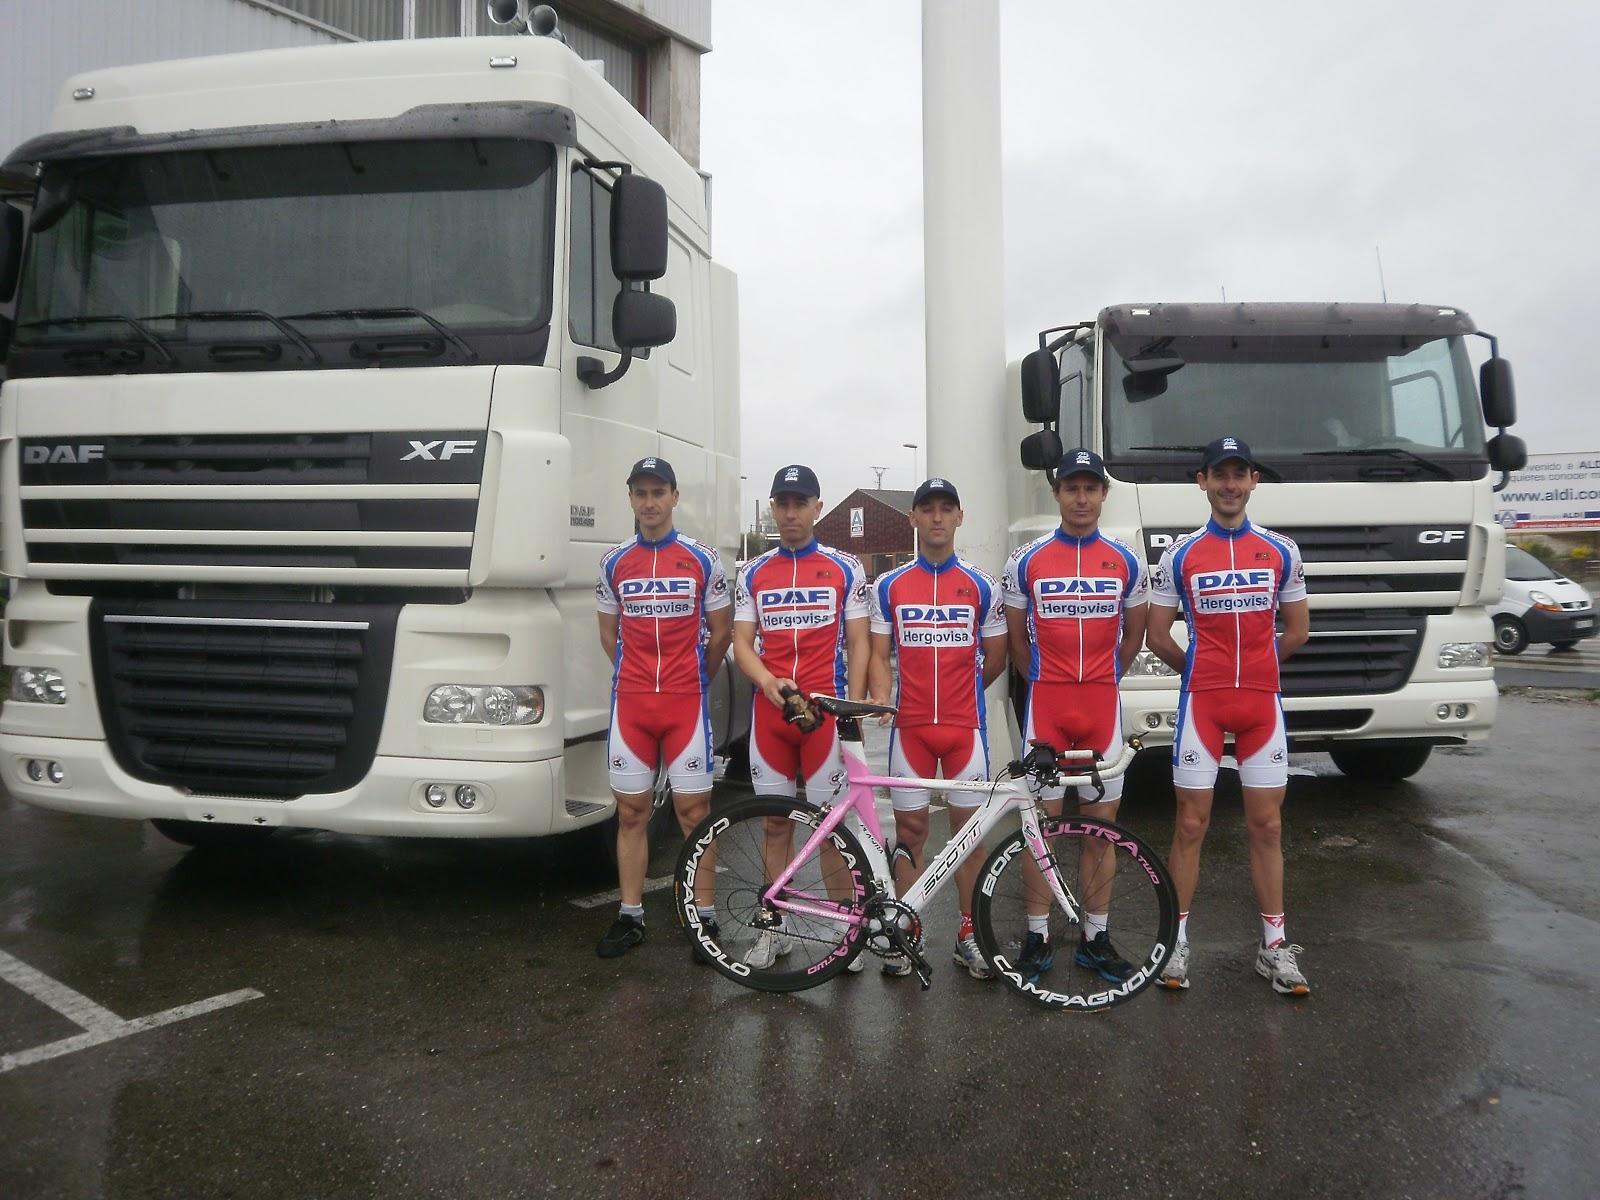 Ben2010 Cycling Team Mayo 2012 # Muebles Telletxea